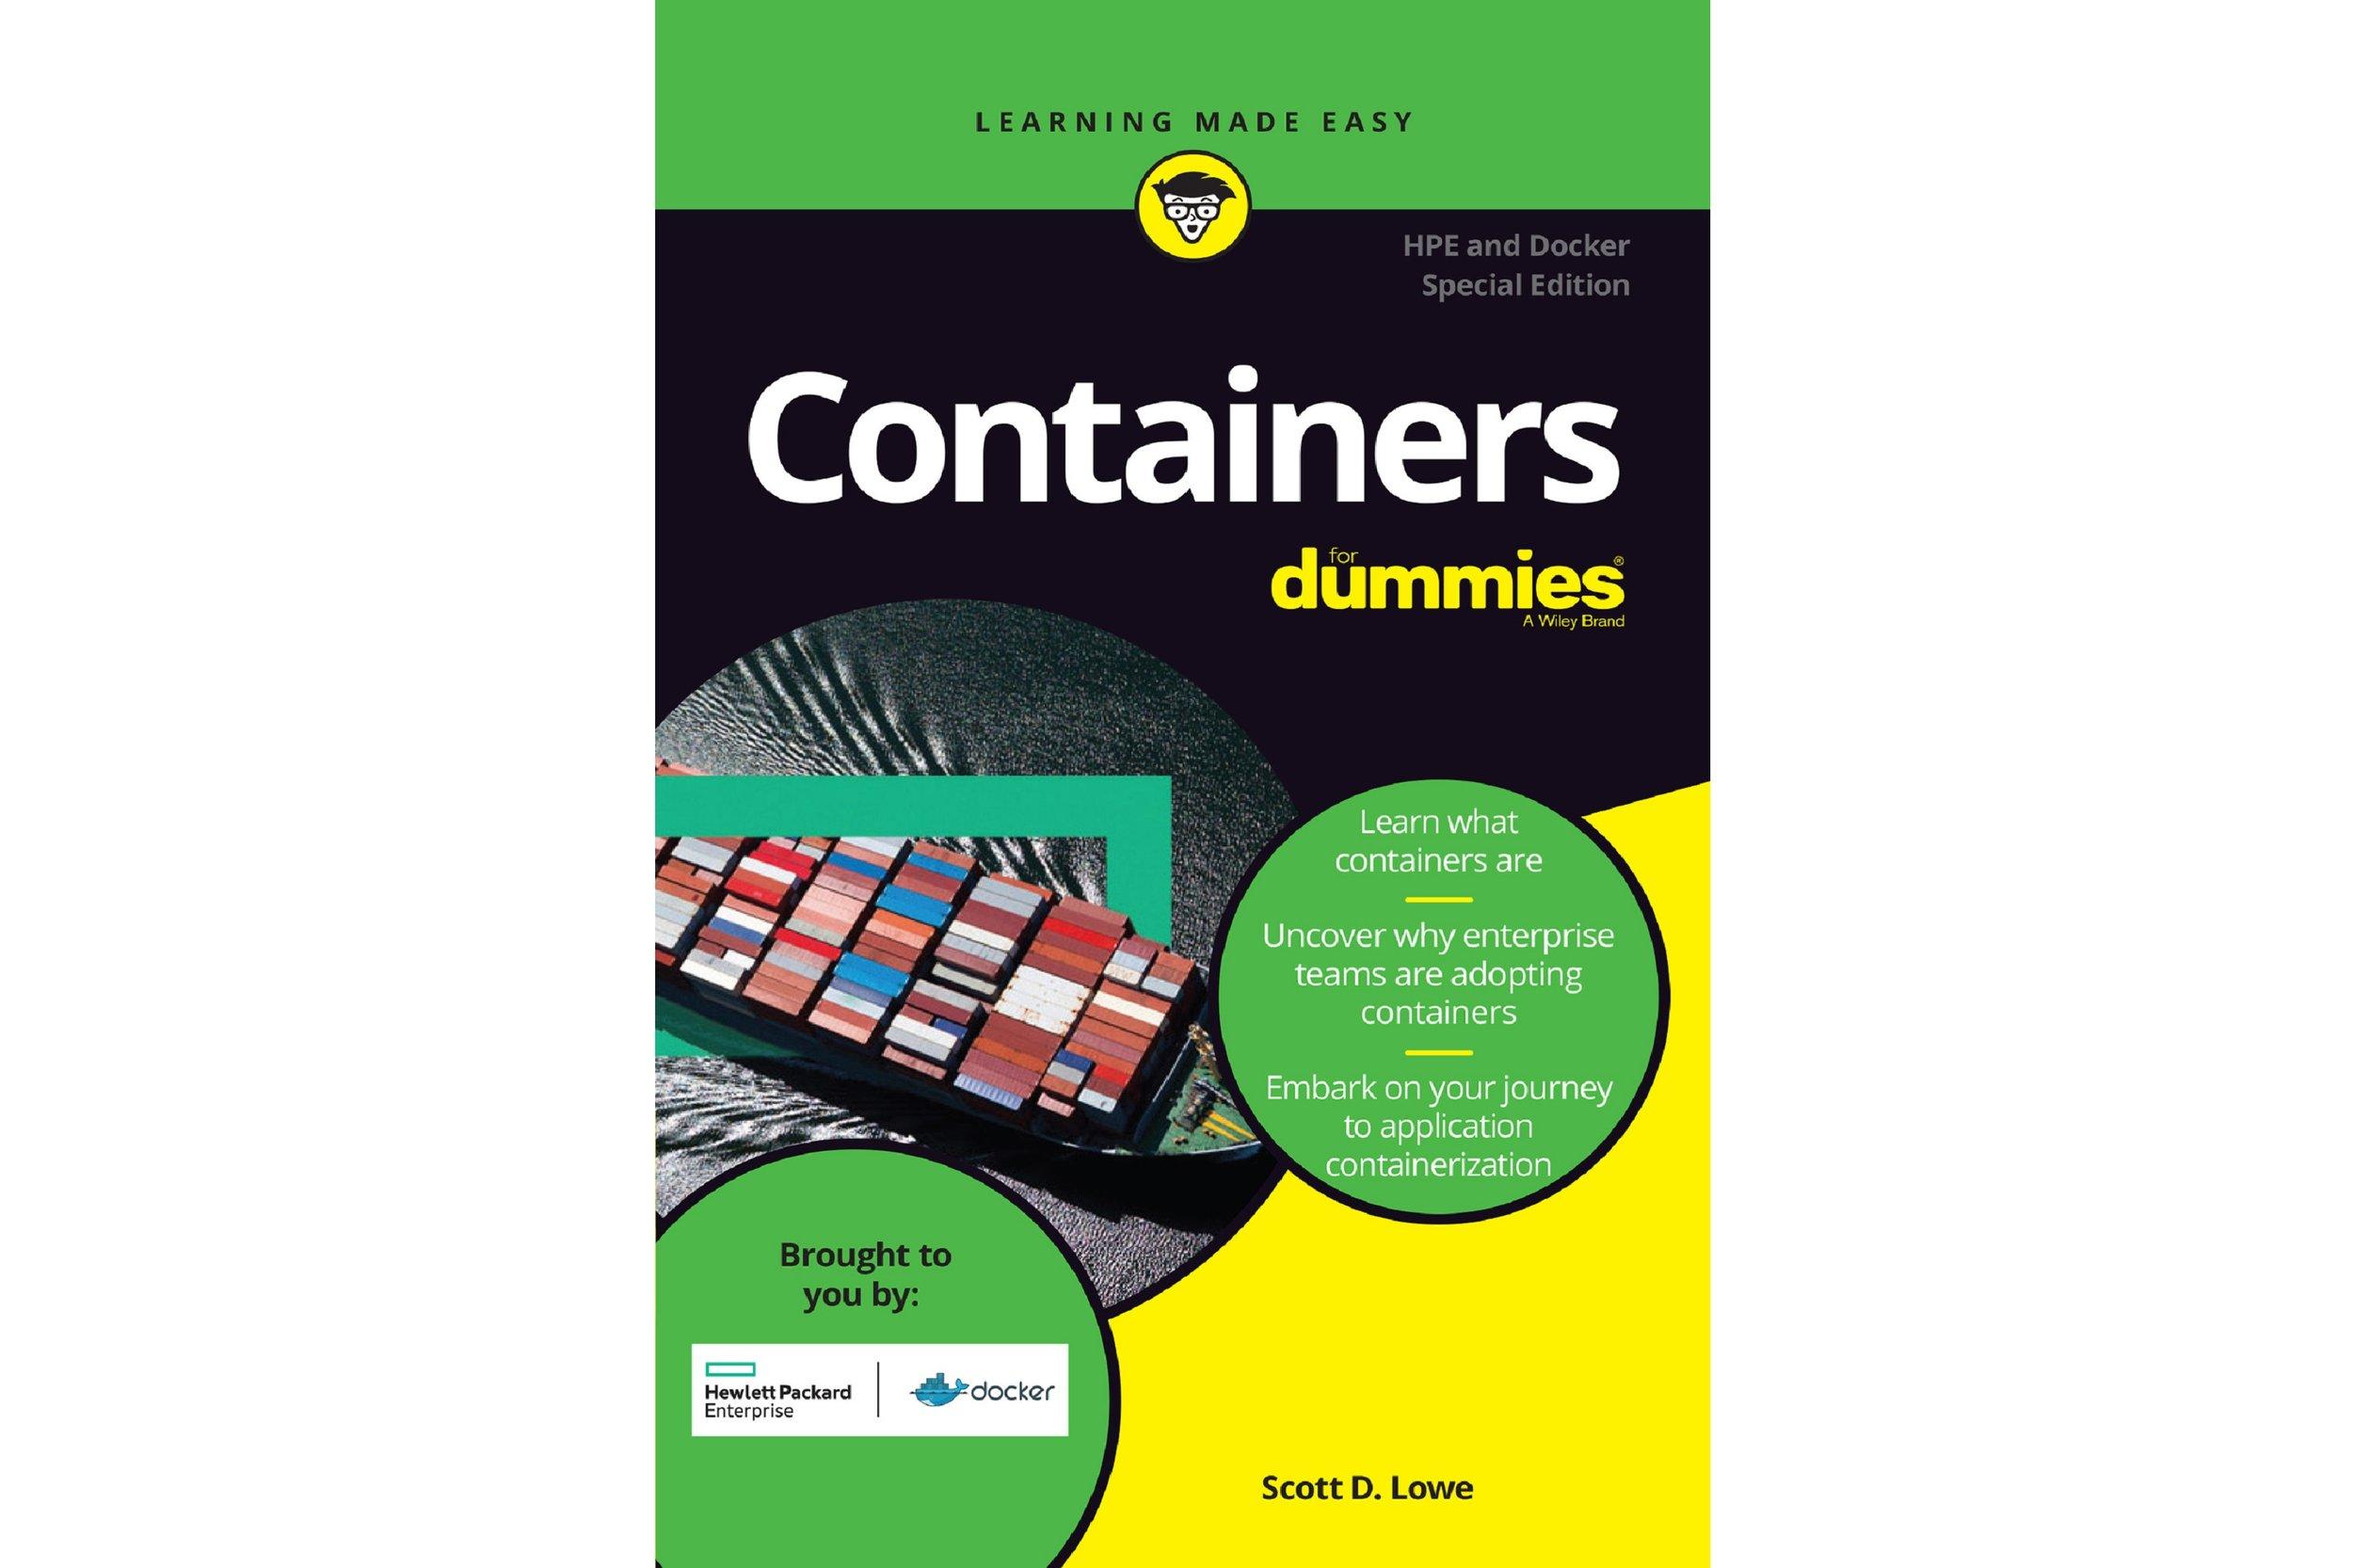 ContainersforDummies.jpg